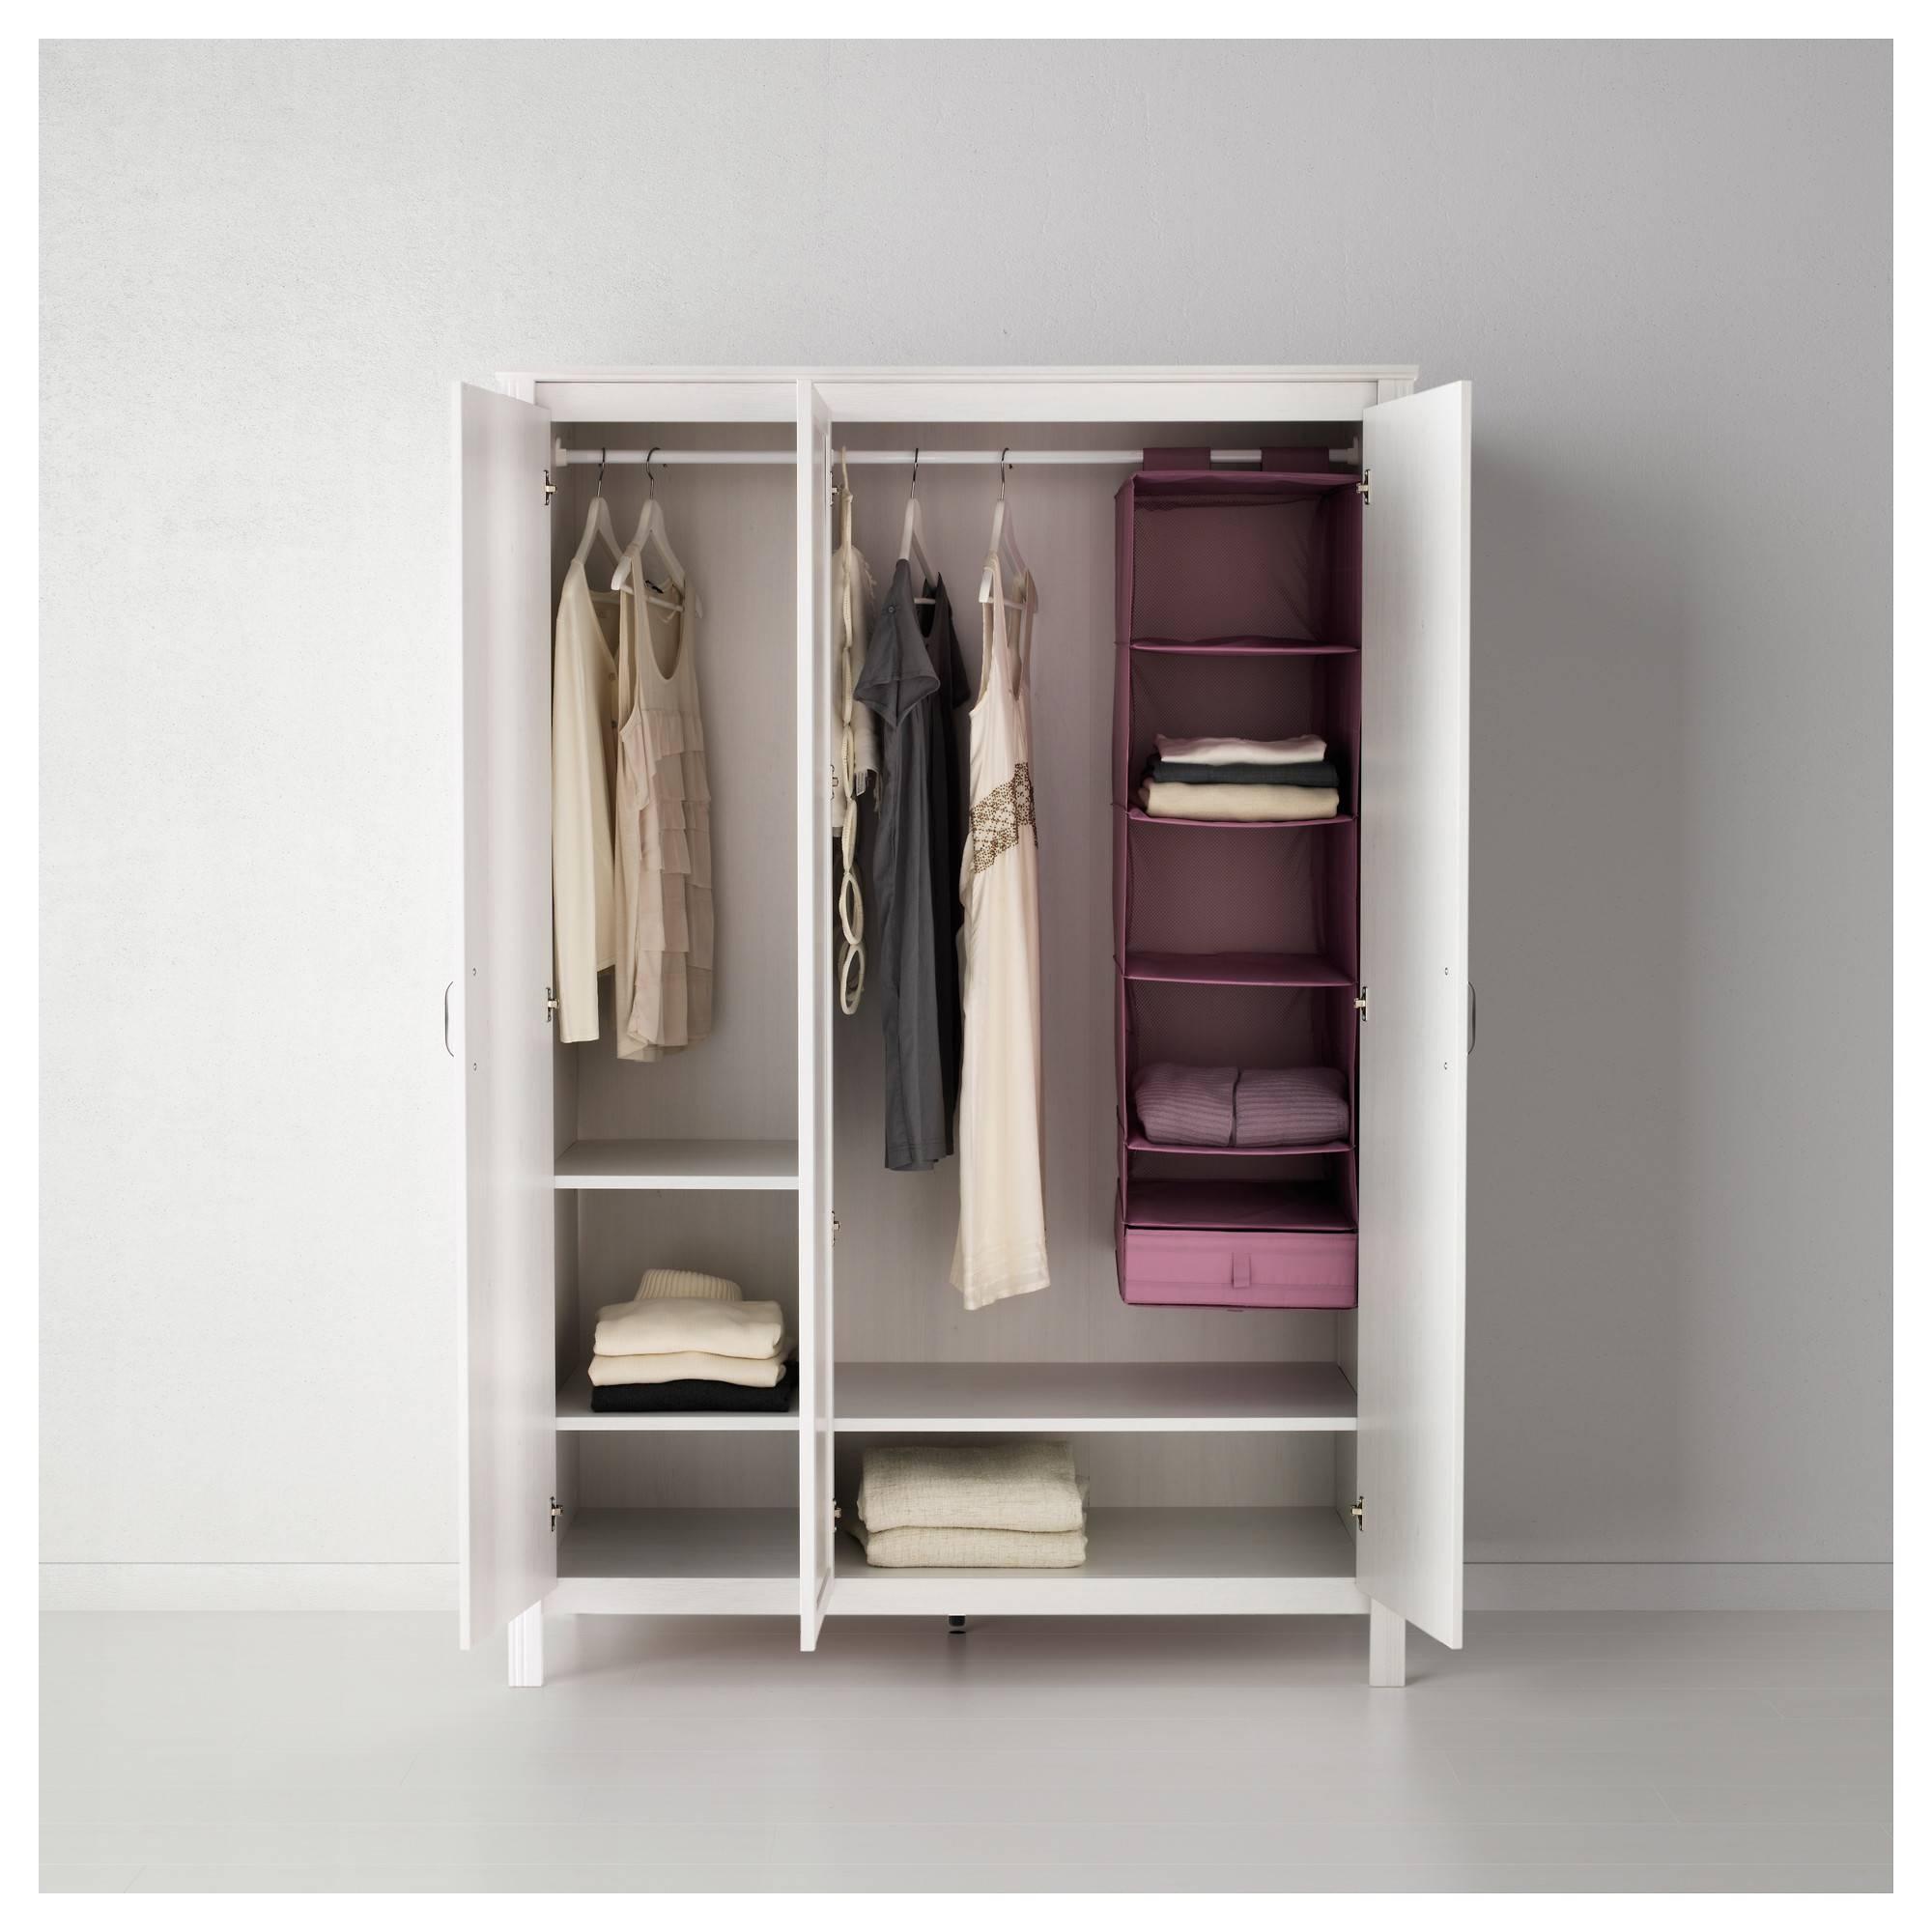 Brusali Wardrobe With 3 Doors White 131X190 Cm - Ikea pertaining to Curved Wardrobe Doors (Image 7 of 30)